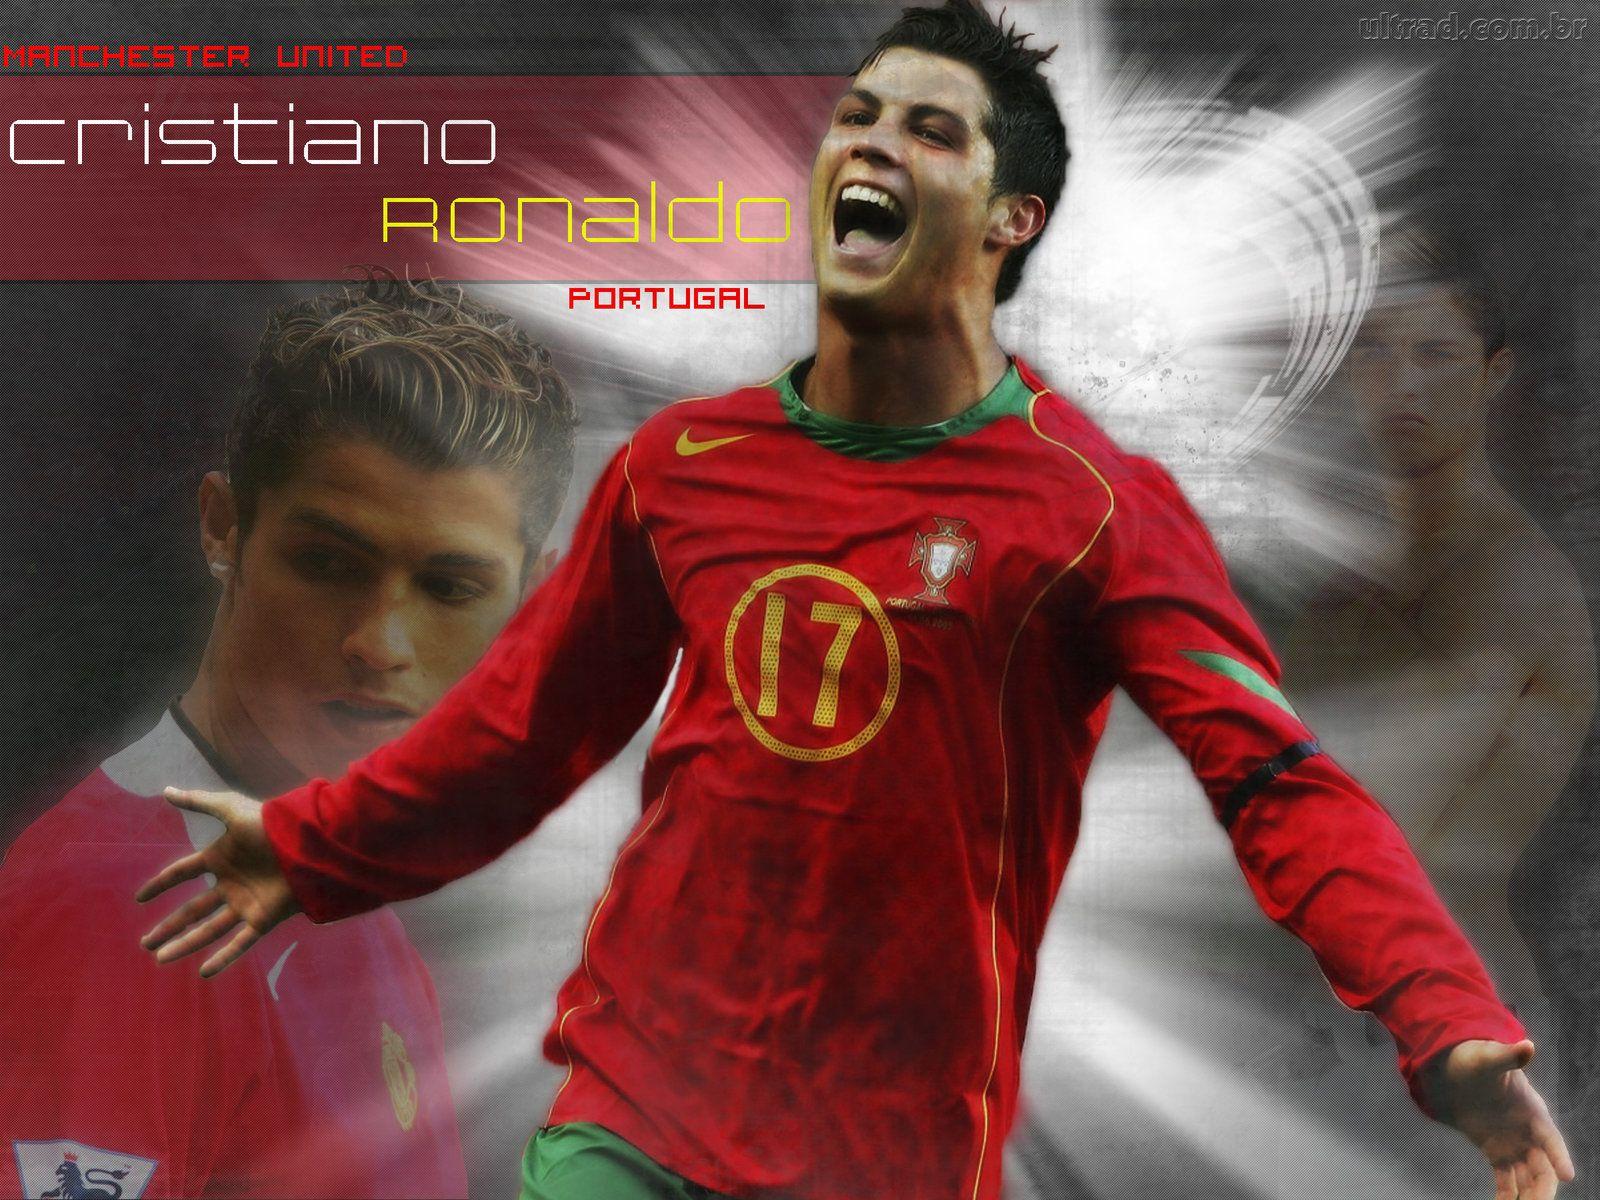 http://1.bp.blogspot.com/-sC20AWZdDPY/UTrwaxDSWPI/AAAAAAAAWeY/a-MKHokTwec/s1600/wallpaper+-+Cristiano+Ronaldo1.jpg